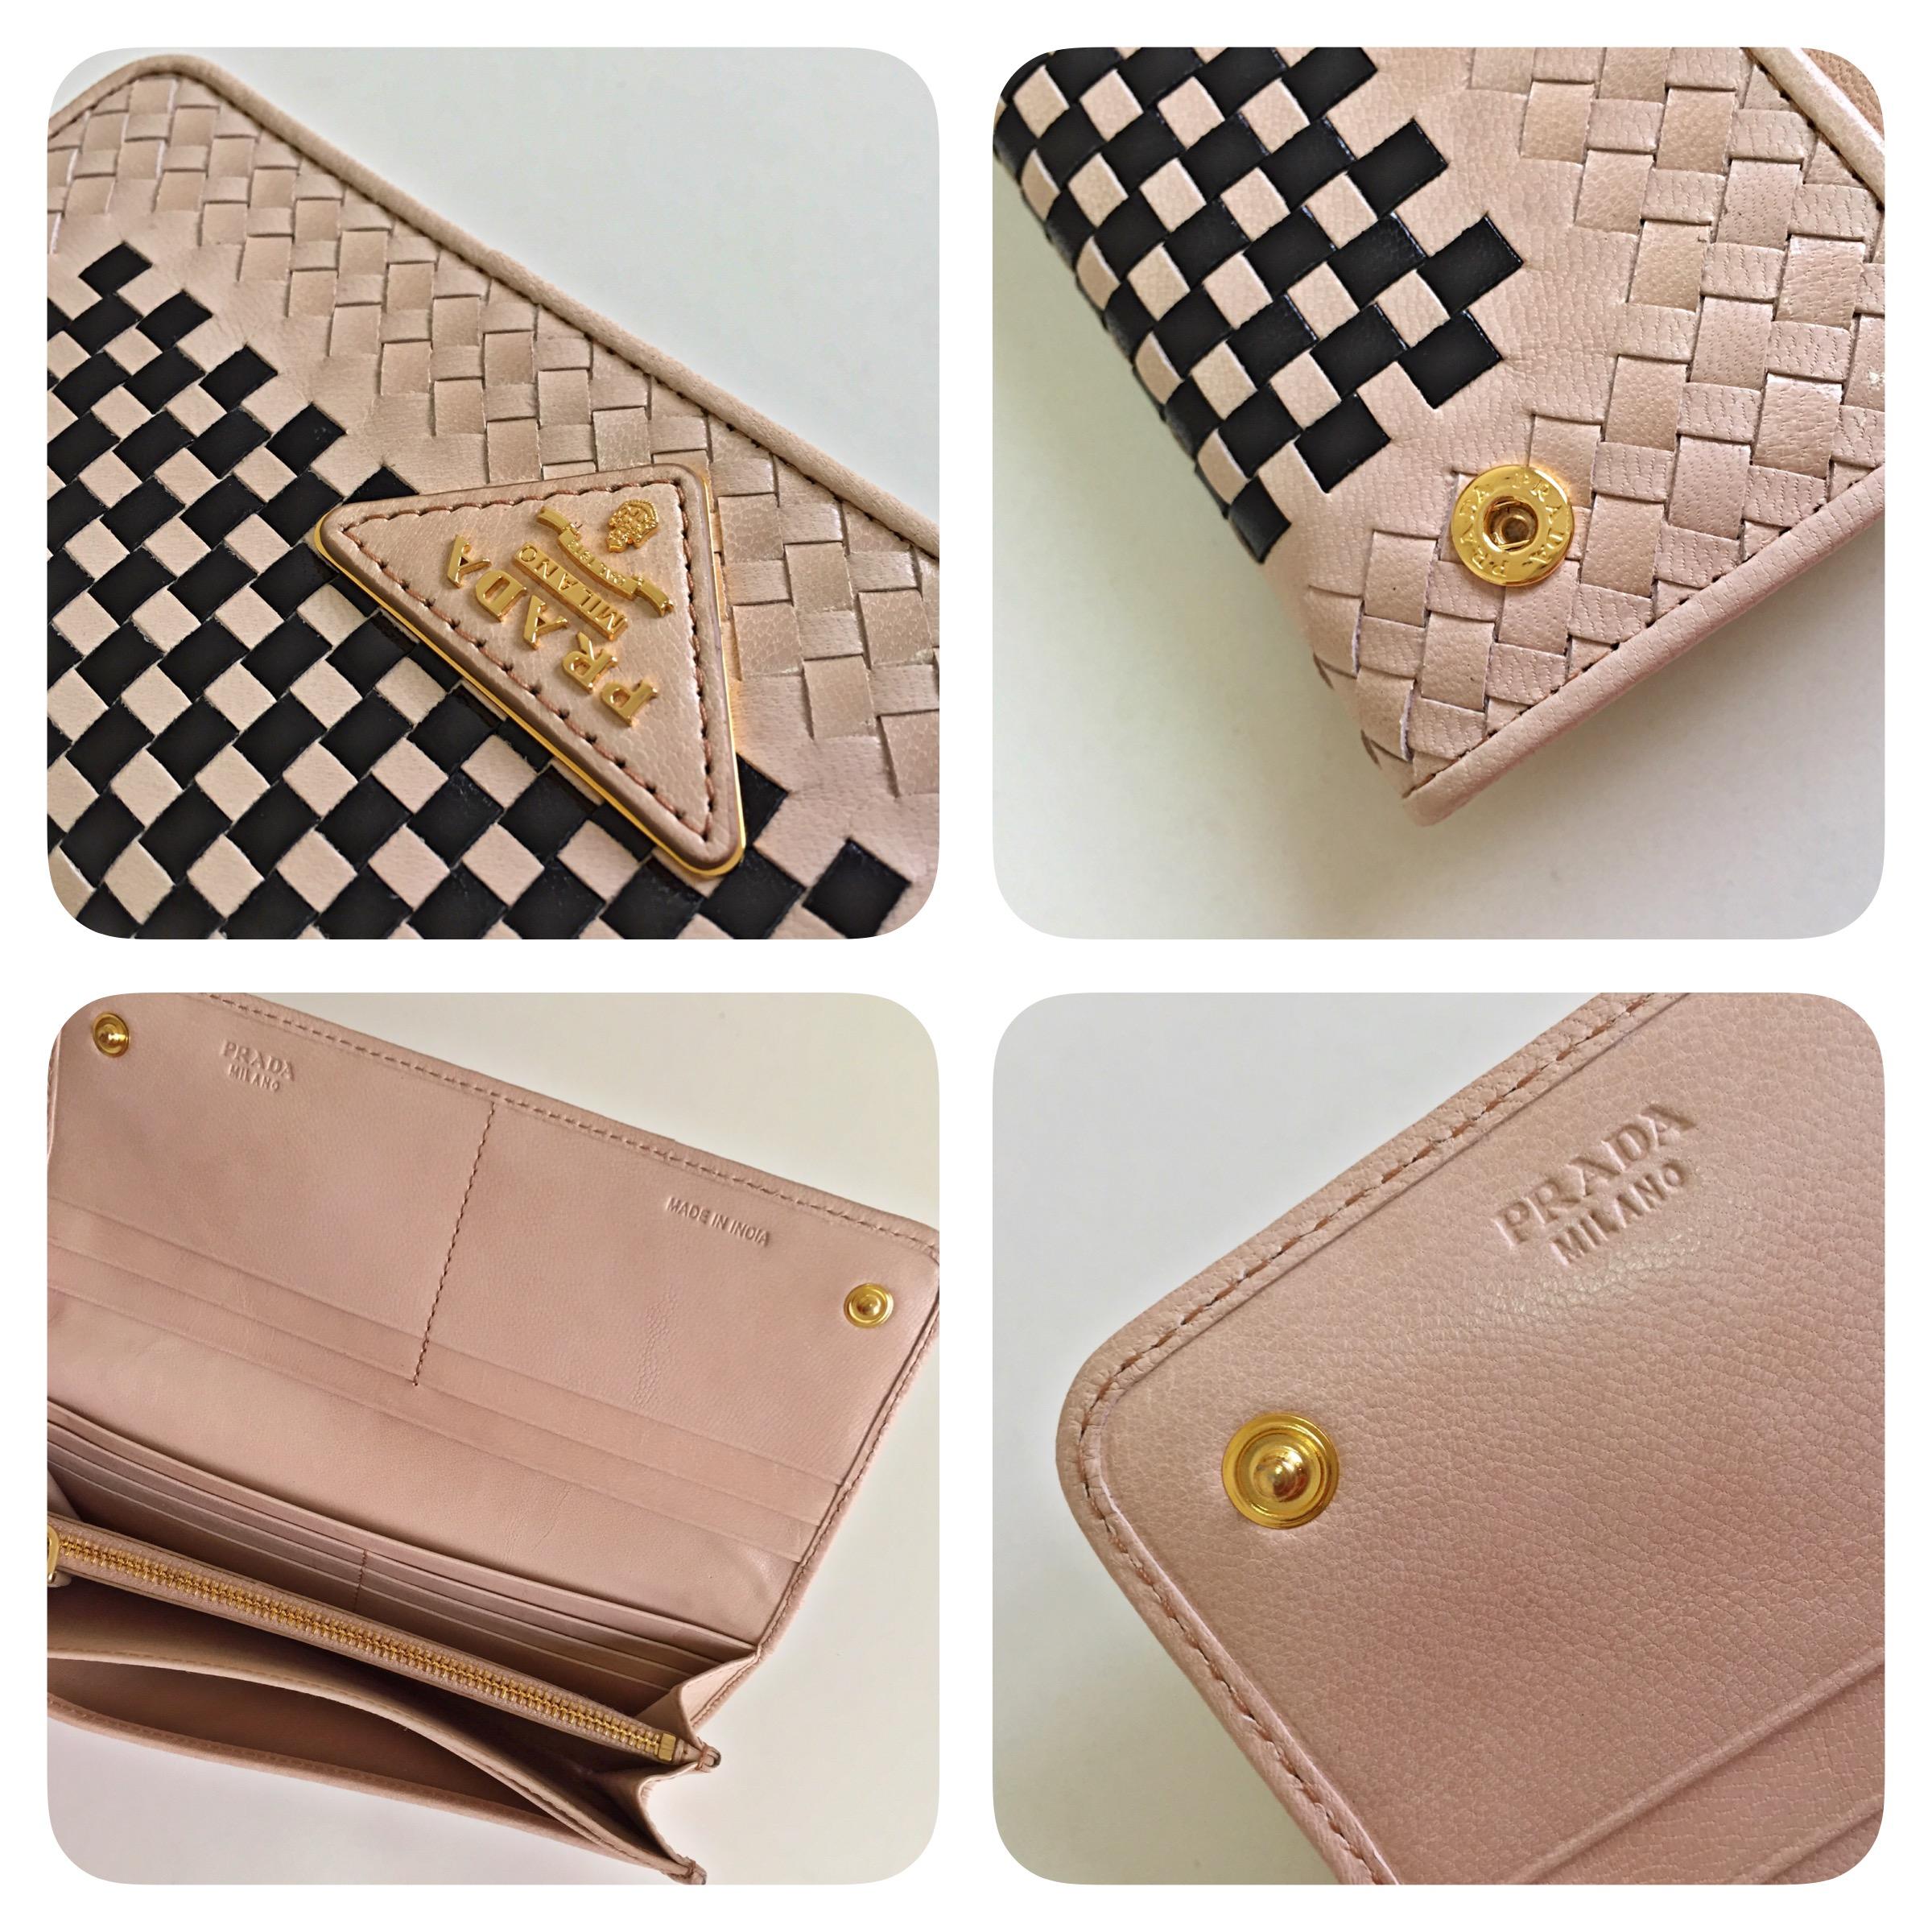 e36551127d47 PRADA Madras Beige + Nero Continental Wallet on Storenvy